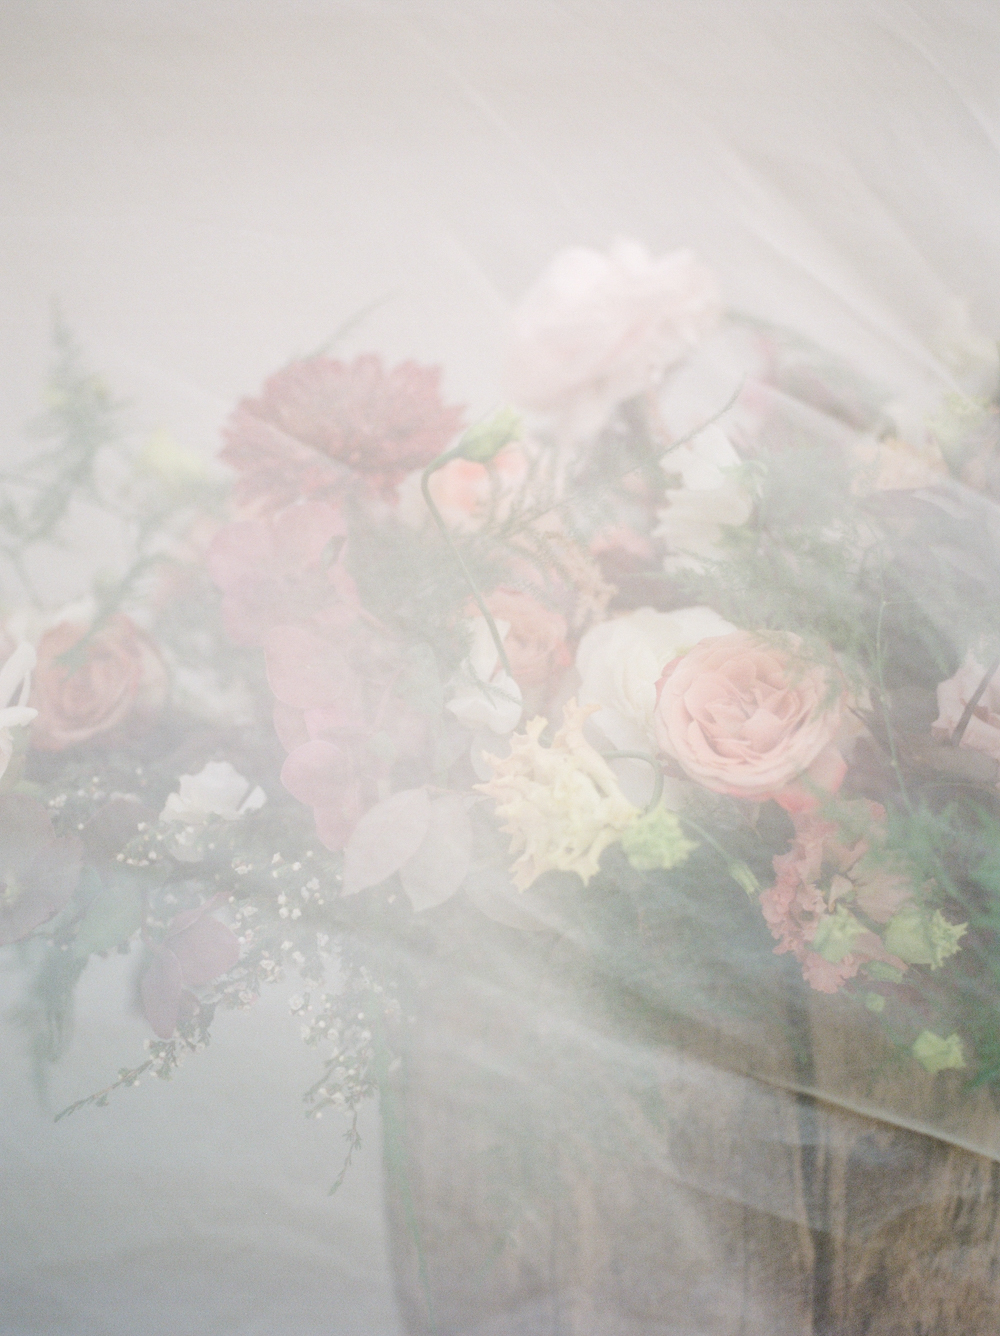 A lovely houston bride_wedding_Christine Gosch_www.christinegosch.com_Houston, TX-10.jpg